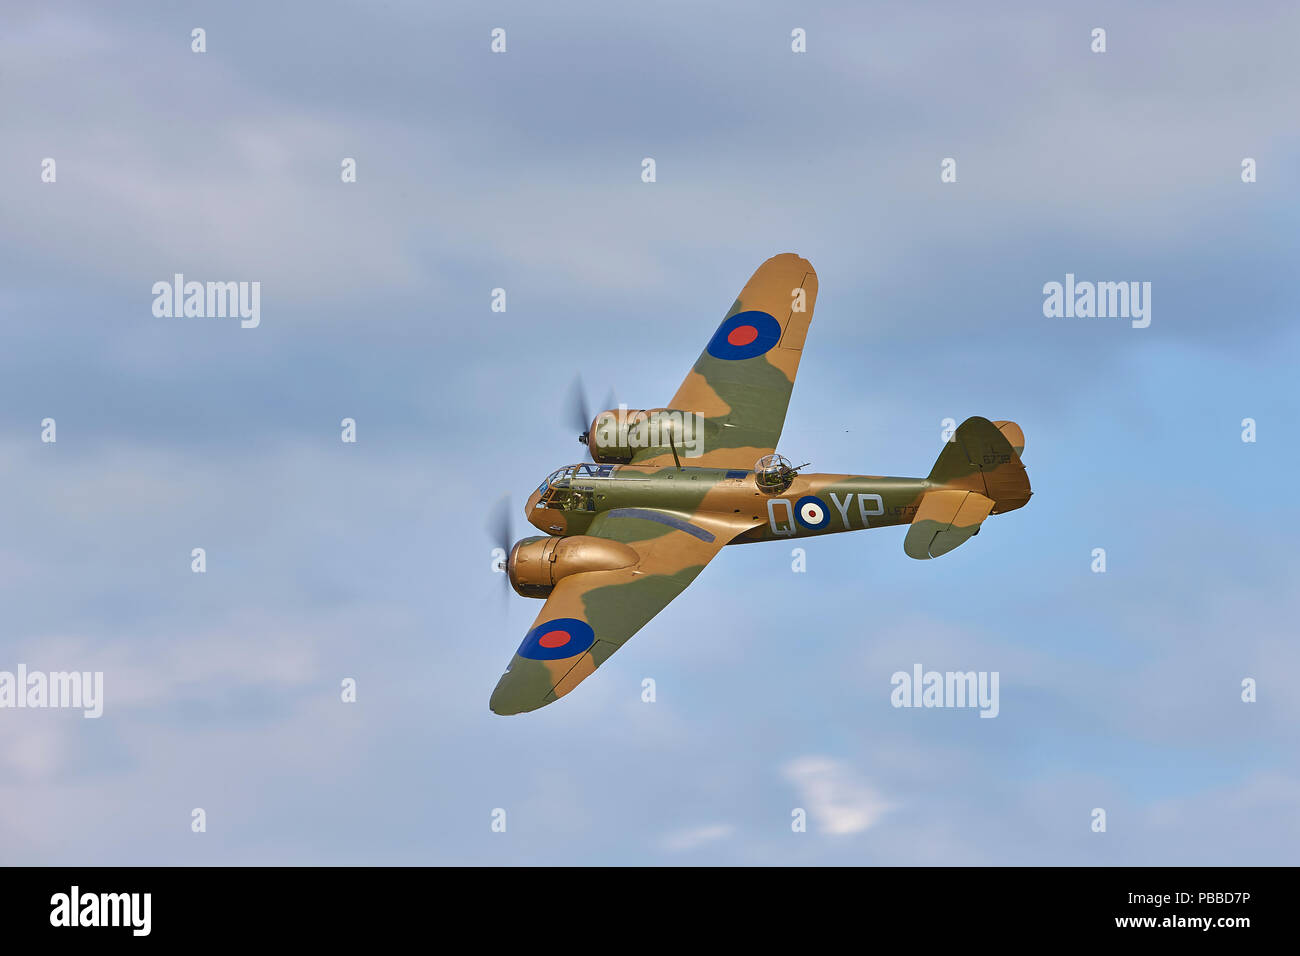 A top side view of a Bristol Blenheim Mk1 G-BPIV representing L6739 (YP-Q) a Blenheim Mk1F of 23 Squadron Stock Photo